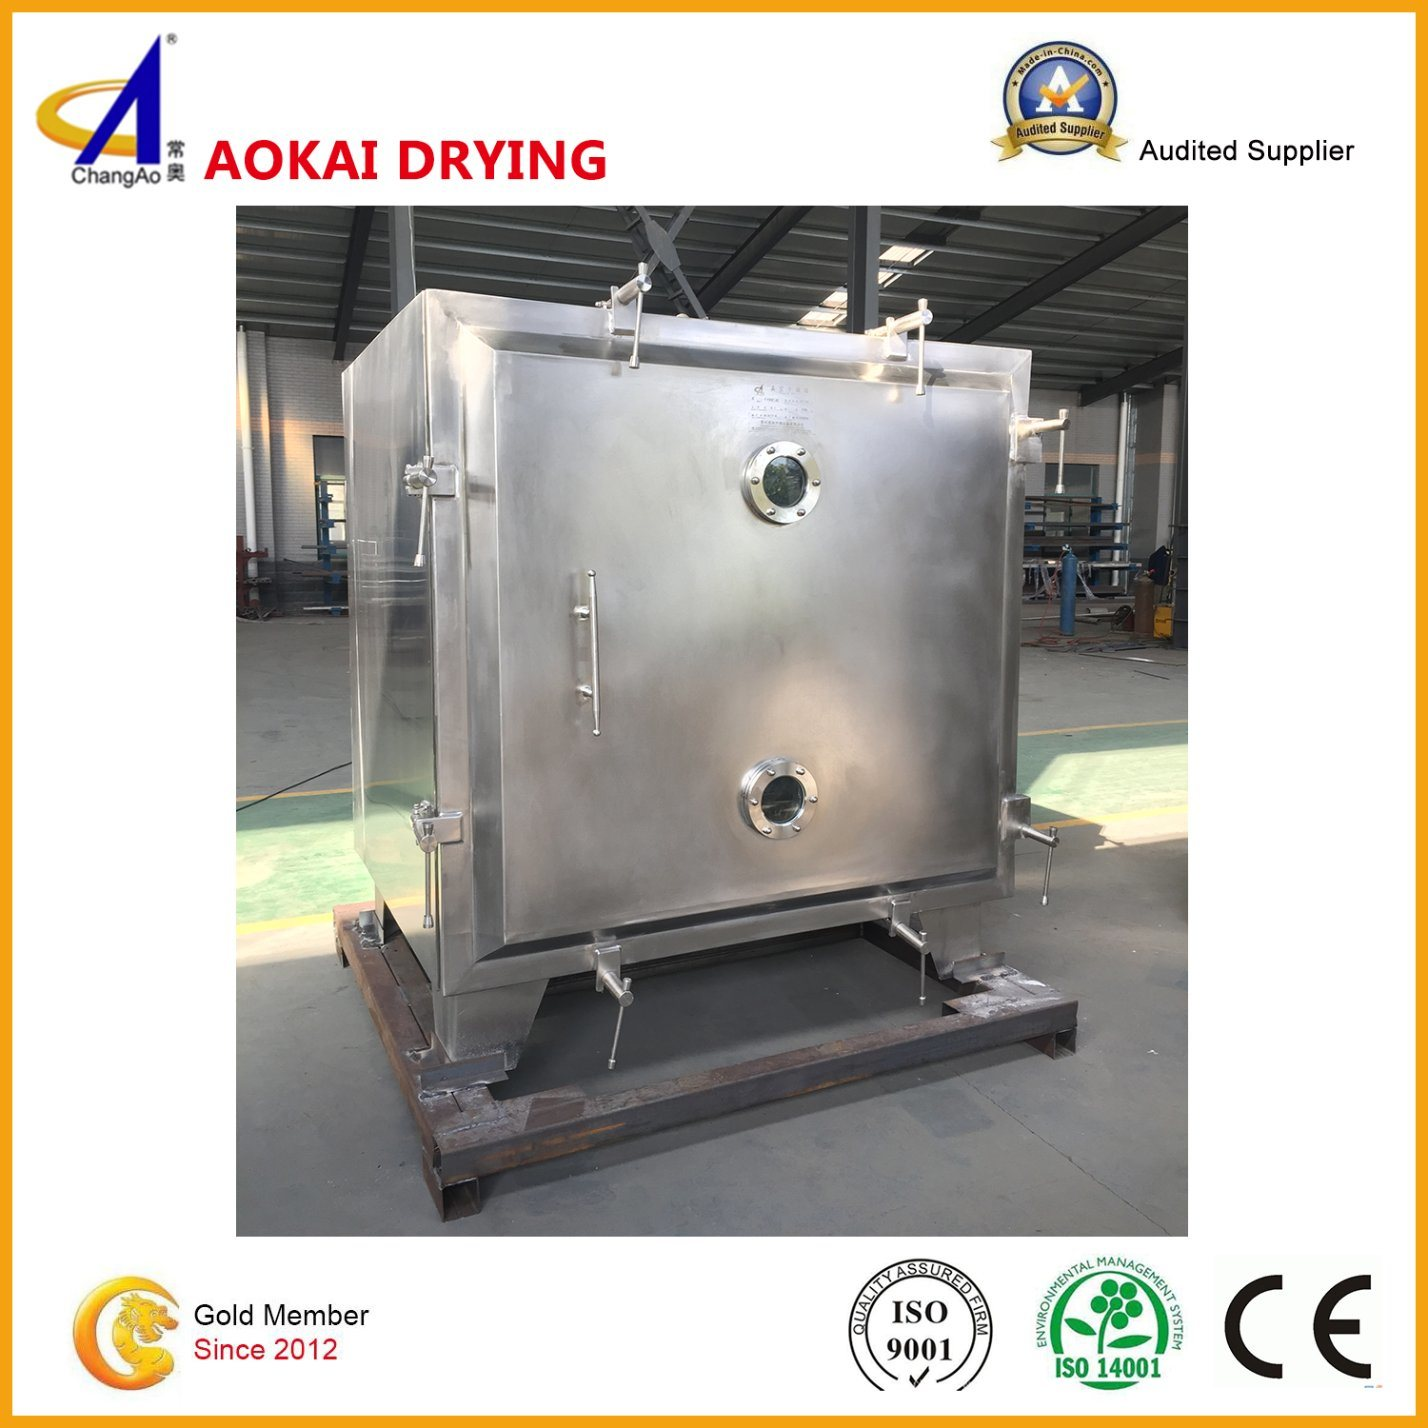 Bacthwise Operation Improved Square Vacuum Drying Machine